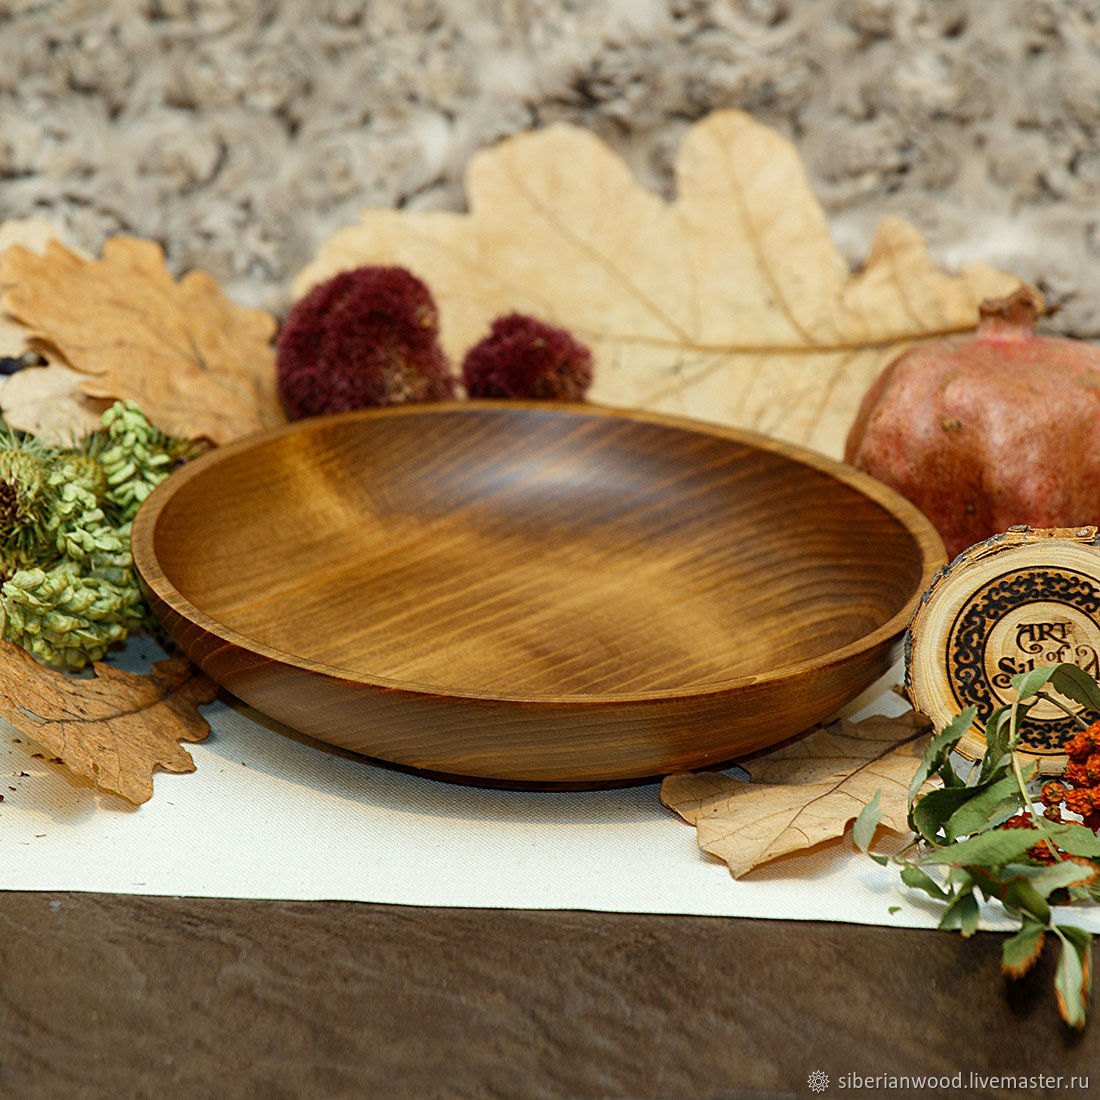 Wooden Plate 19 cm 100%#65, Plates, Novokuznetsk,  Фото №1